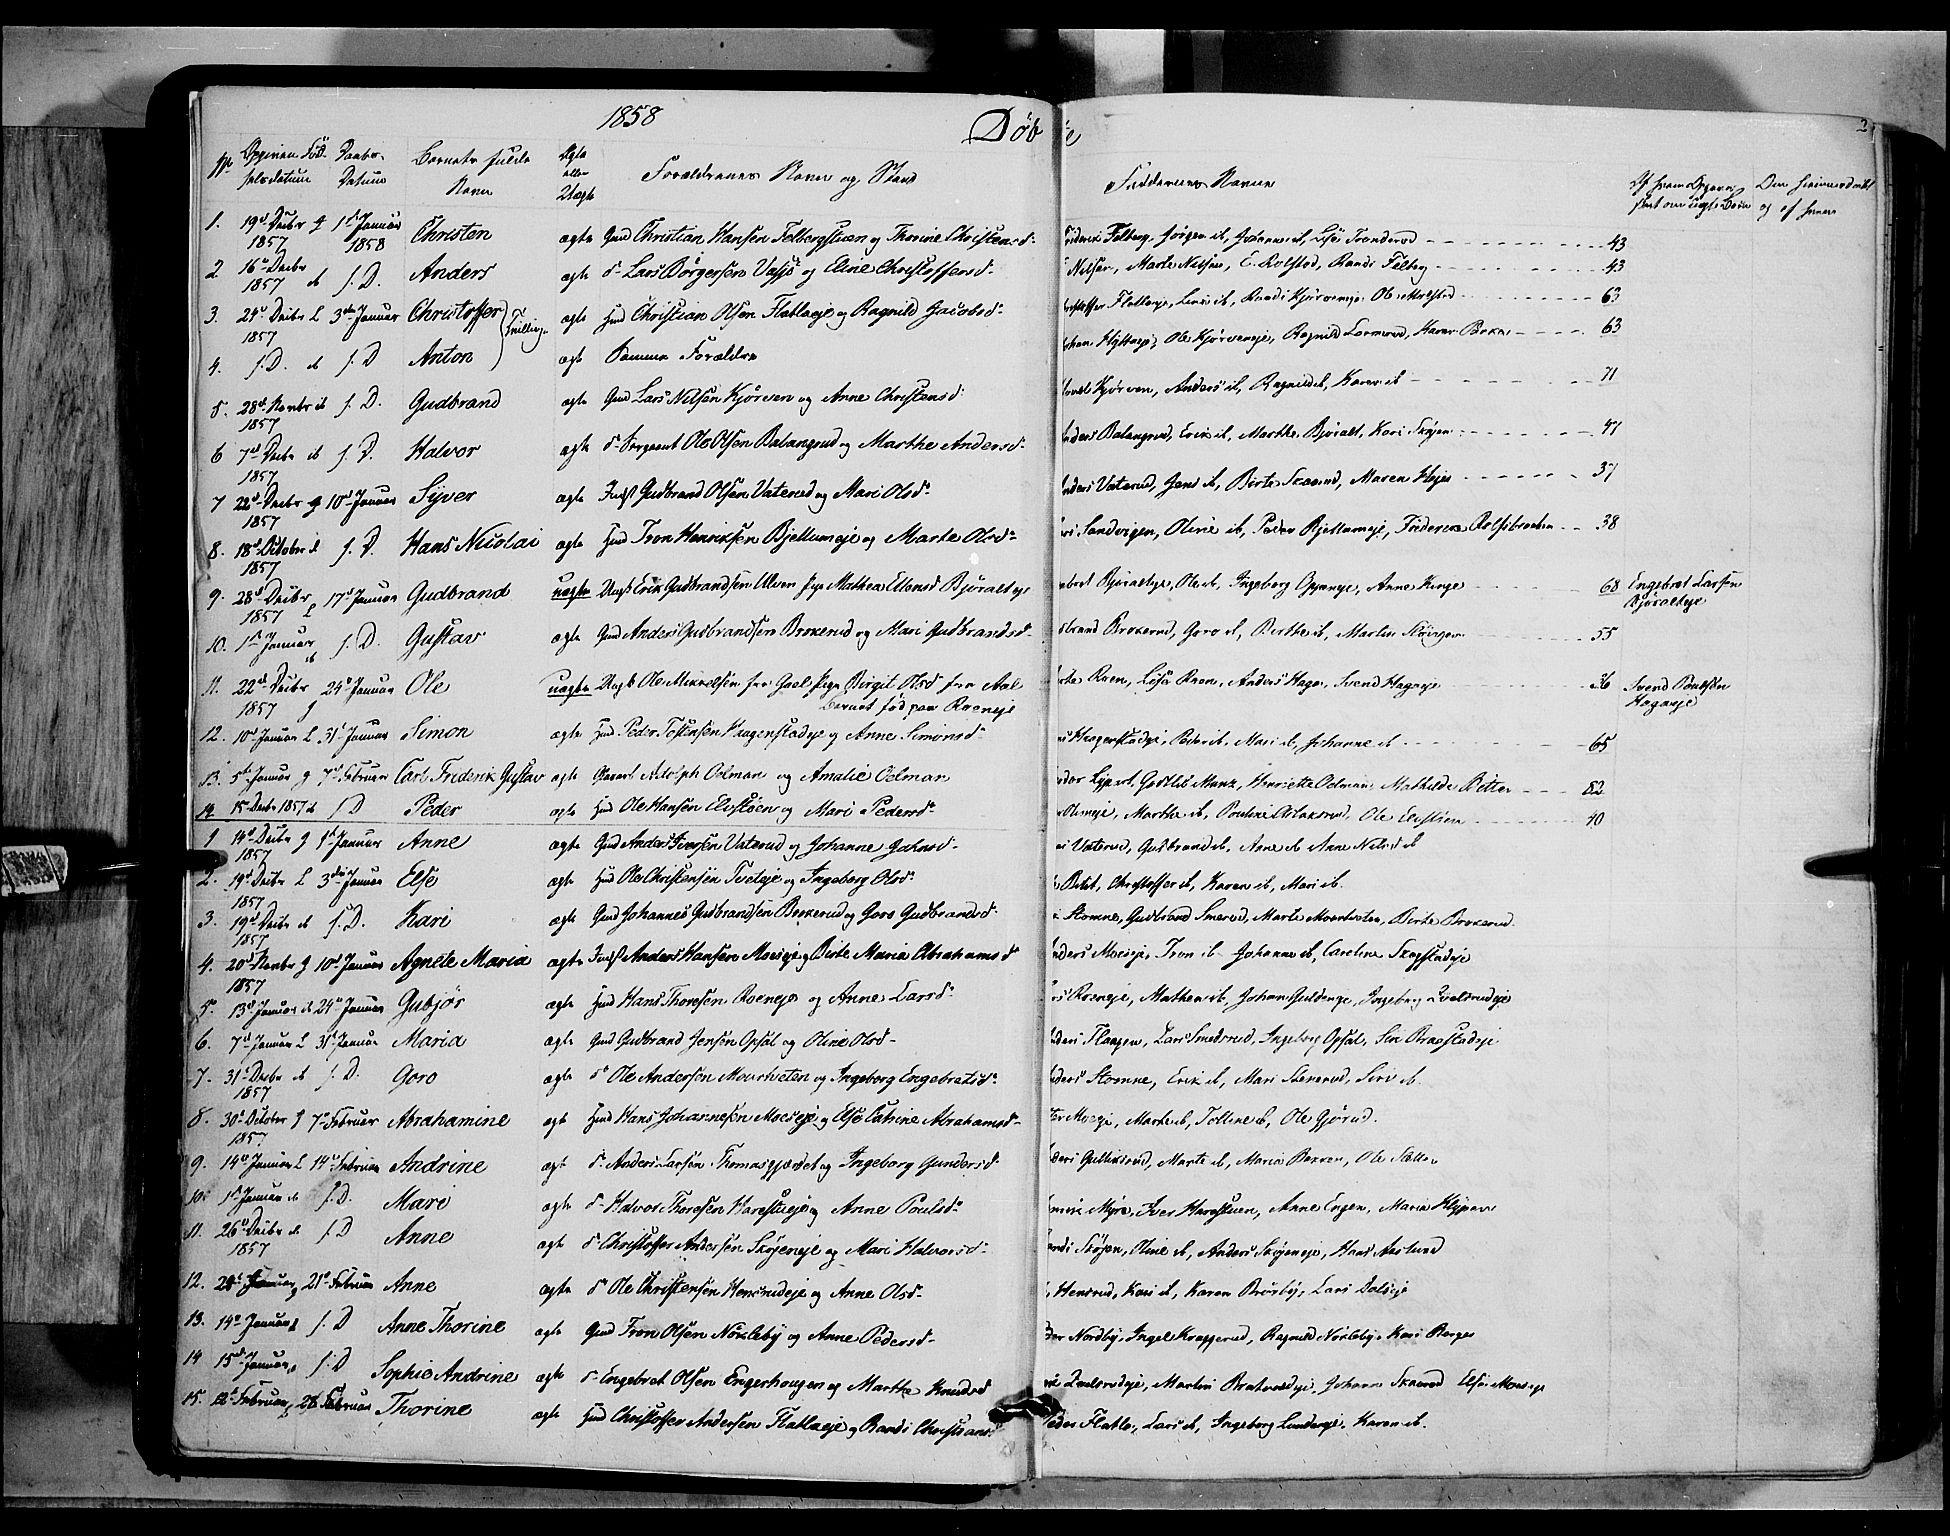 SAH, Jevnaker prestekontor, Ministerialbok nr. 7, 1858-1876, s. 2